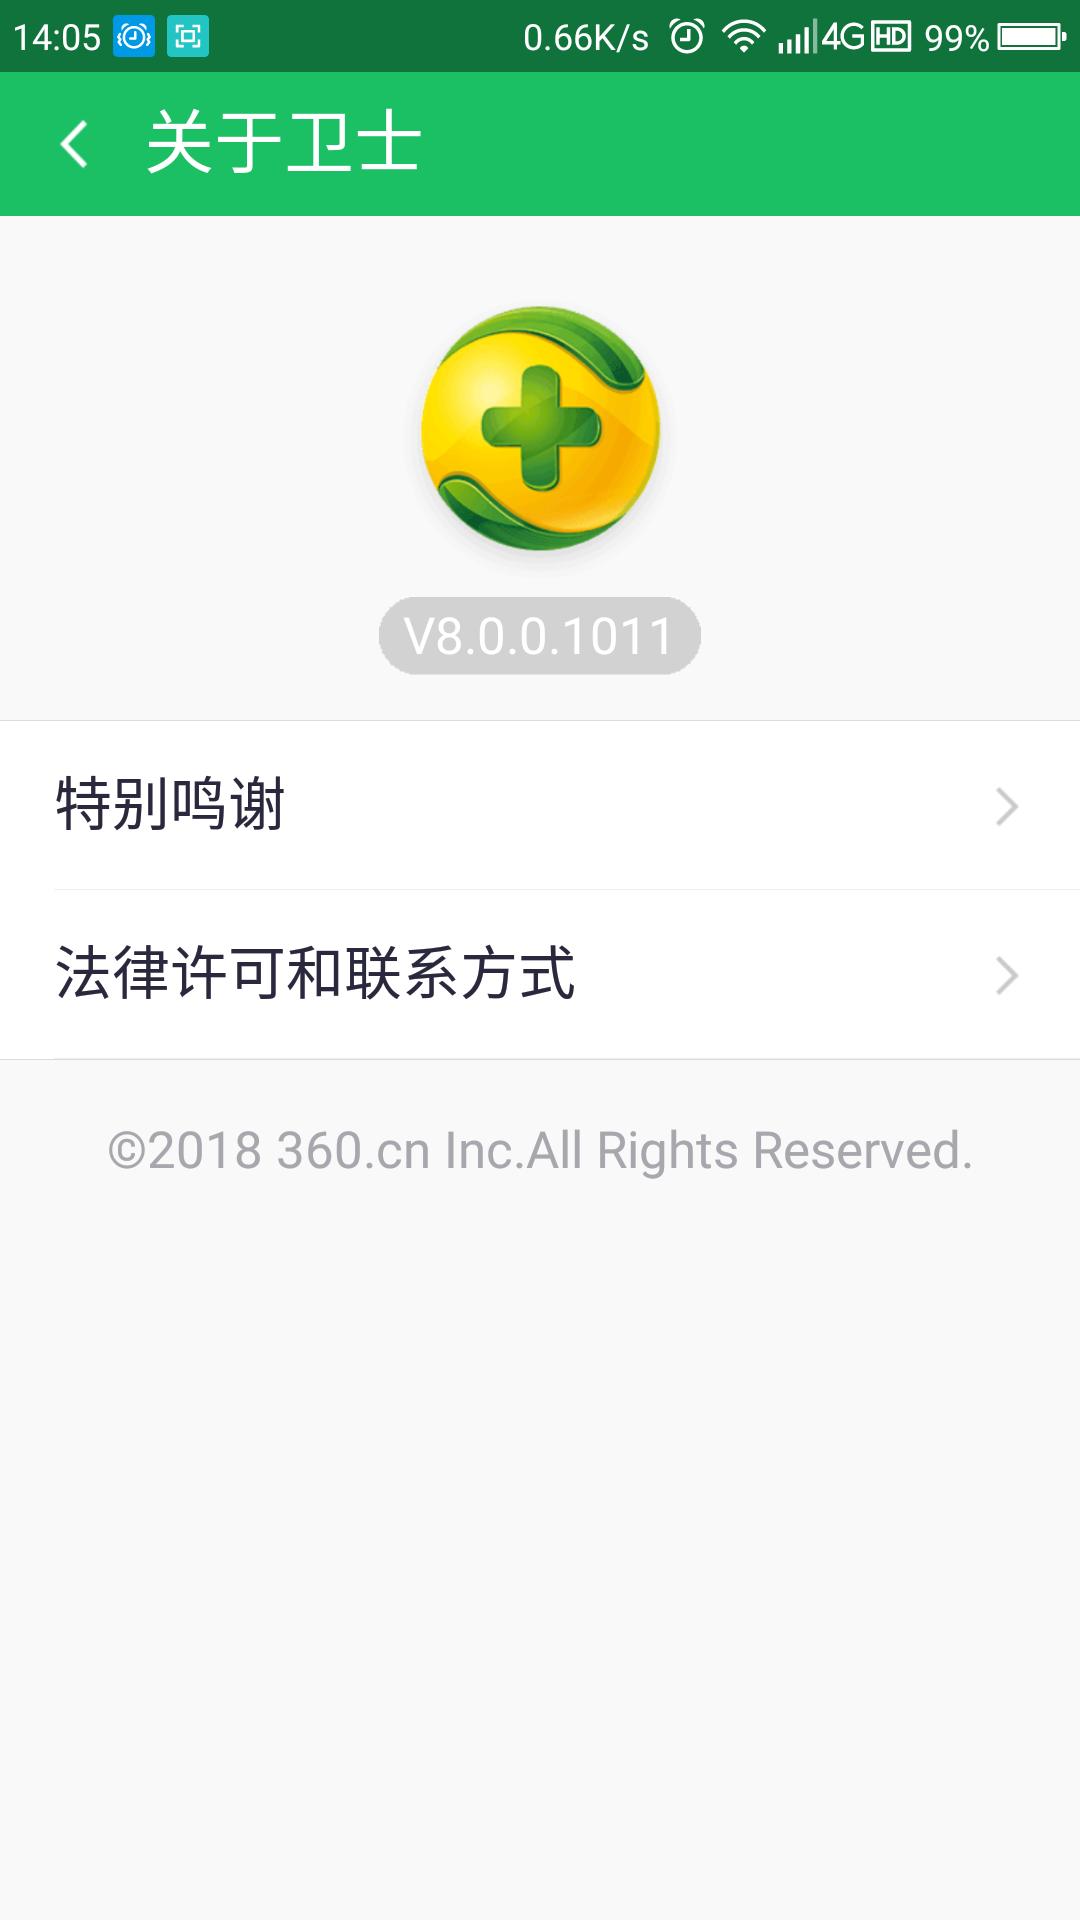 Screenshot_2018-10-27-14-05-15.png